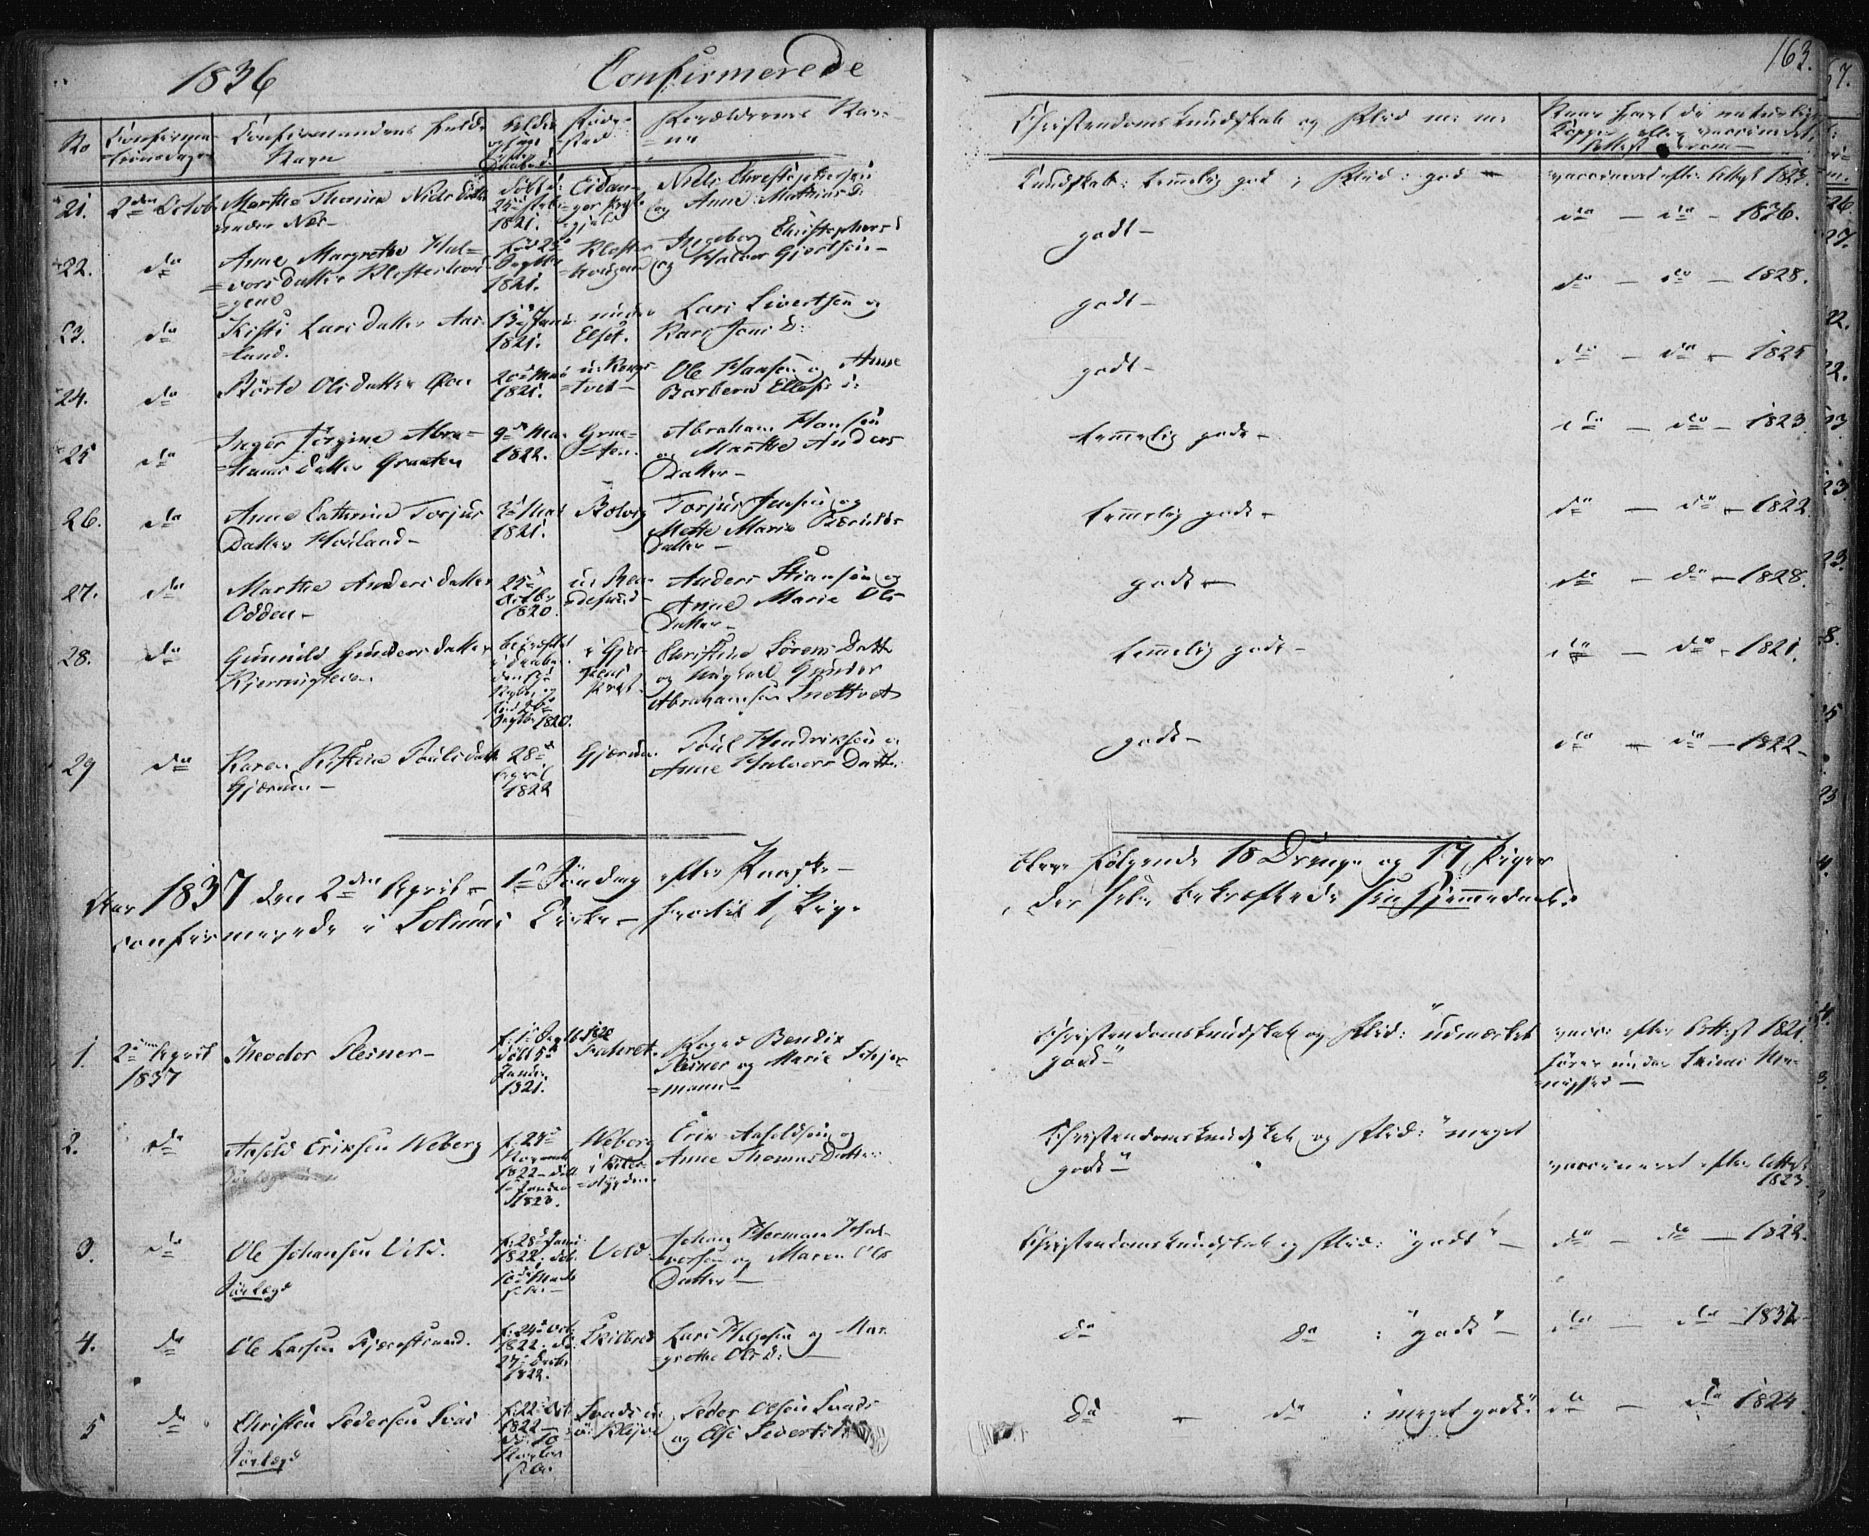 SAKO, Solum kirkebøker, F/Fa/L0005: Ministerialbok nr. I 5, 1833-1843, s. 163